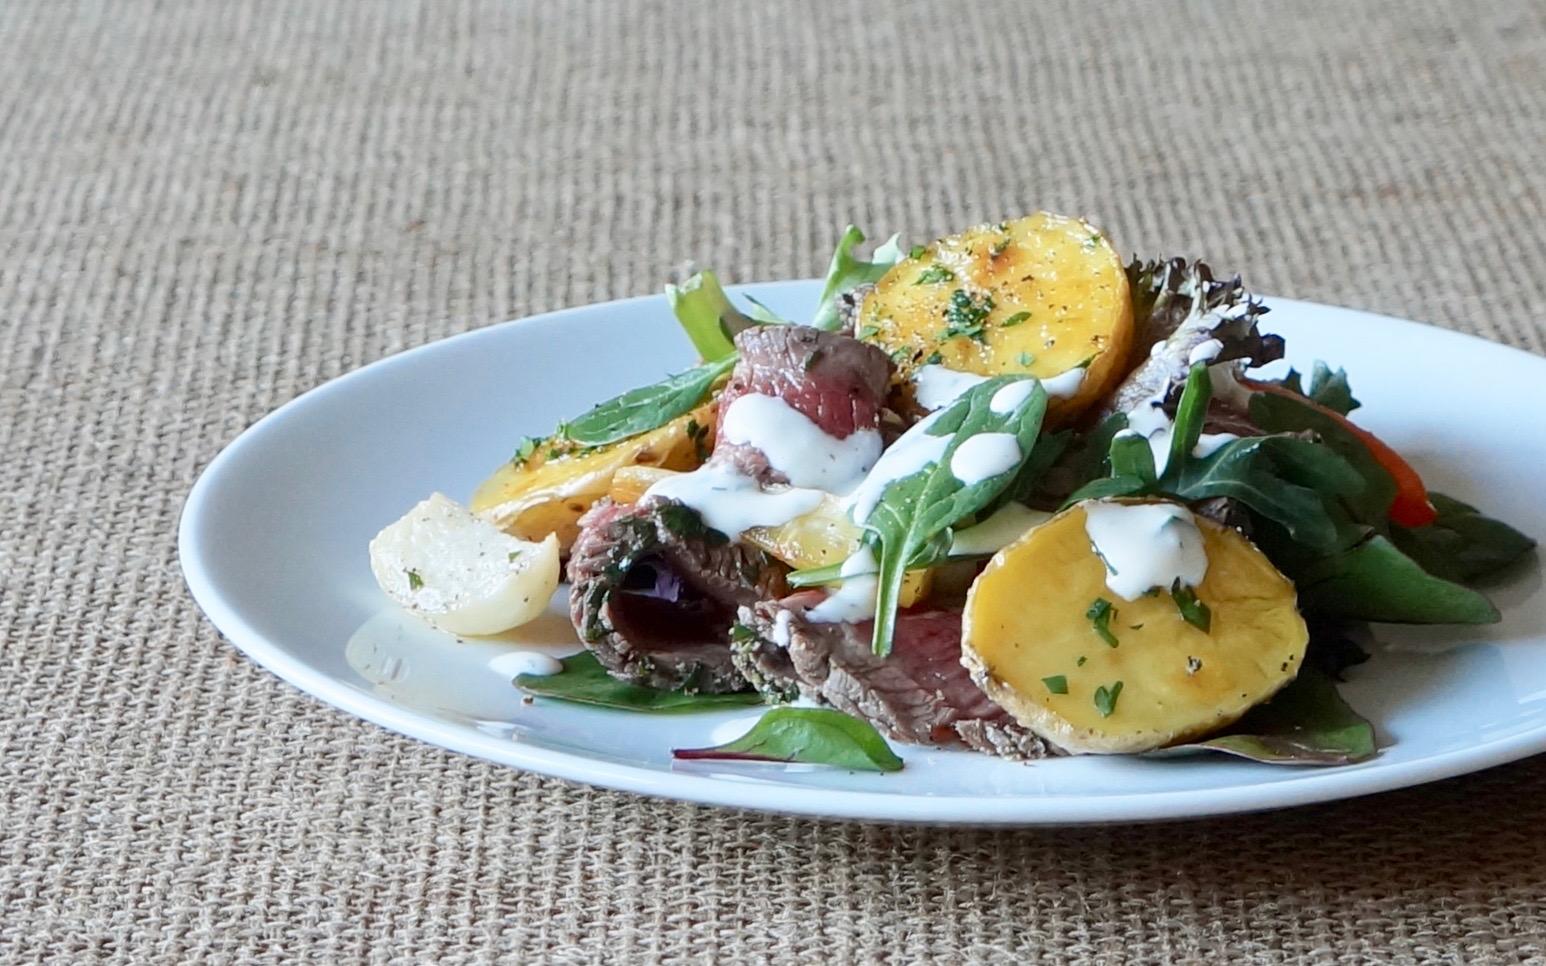 Lemon-Thyme-Top-Sirloin-Steak-Salad-Roasted-Winter-Root-Vegetables-Rebecca-Gordon-Publisher-Buttermilk-Lipstick-Culinary-Entertaining-Techniques-RebeccaGordon-Pastry-Chef-Birmingham-Alabama